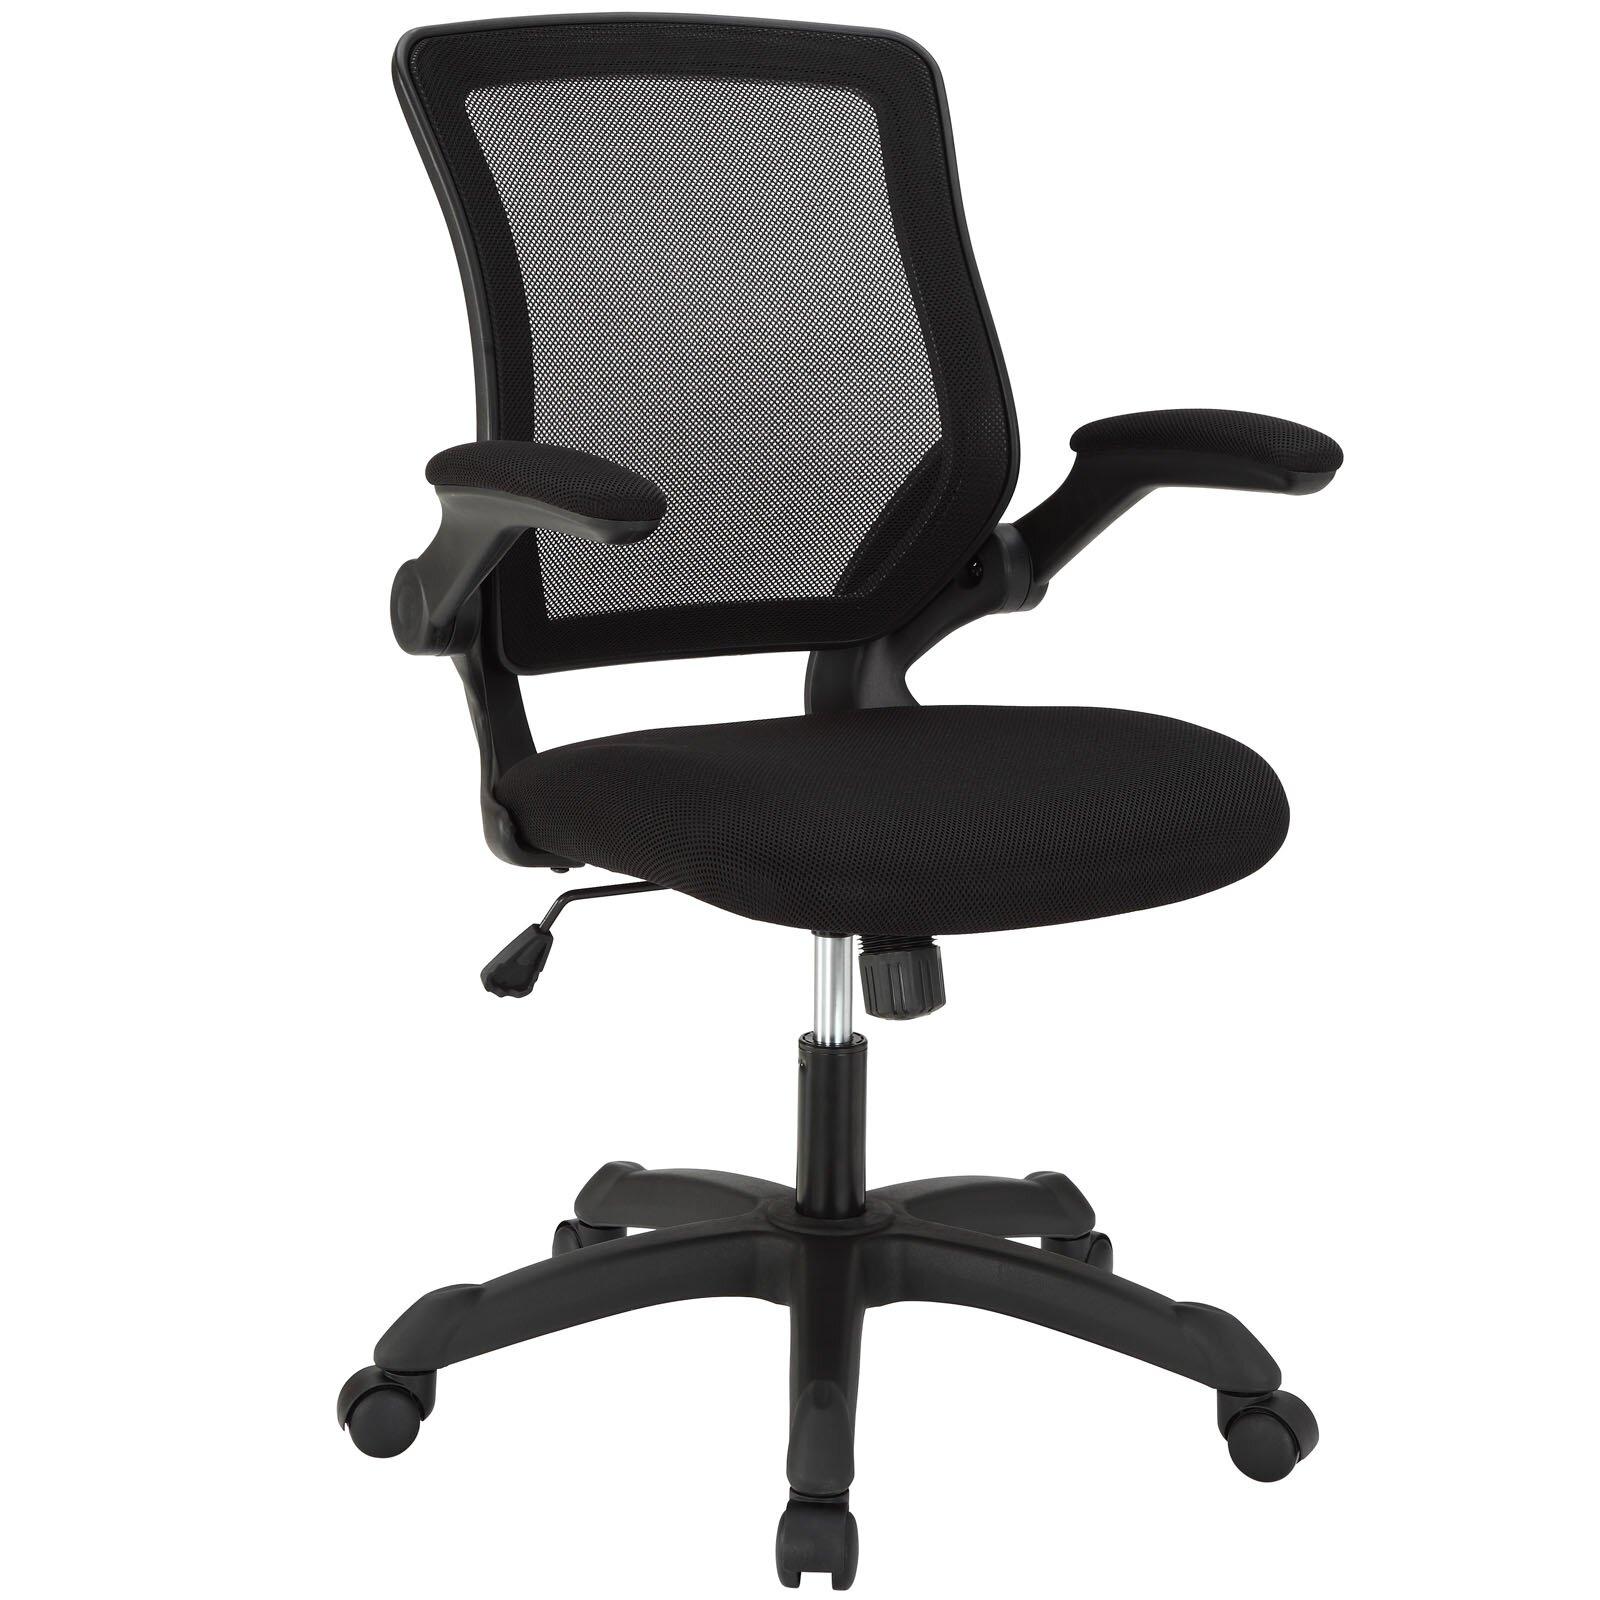 Zipcode Design Greer High Back Mesh Desk Office Chair  : Zipcode2525E22525842525A2 Design Greer High Back Mesh Desk Office Chair ZIPC3959 from www.wayfair.com size 1600 x 1600 jpeg 258kB